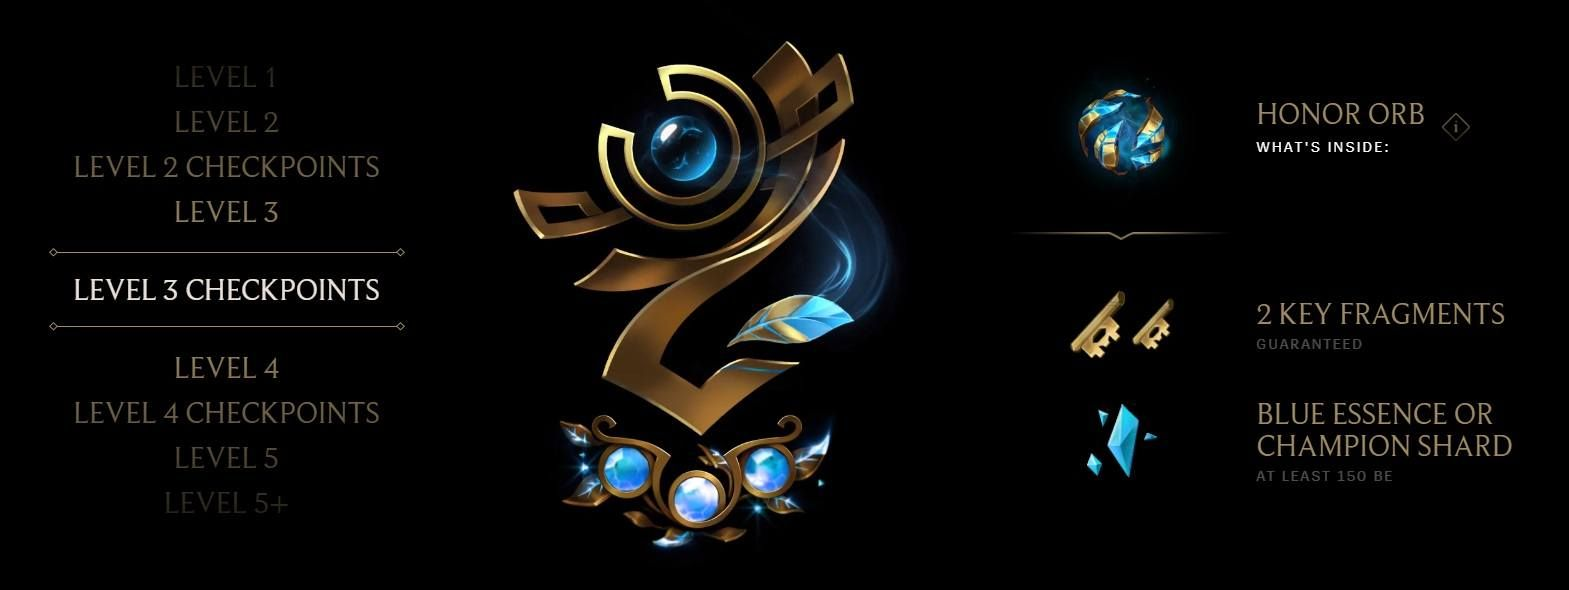 18e4e1f4b88e91265654f48bba413cb9 - How To Get Honor Level 3 League Of Legends